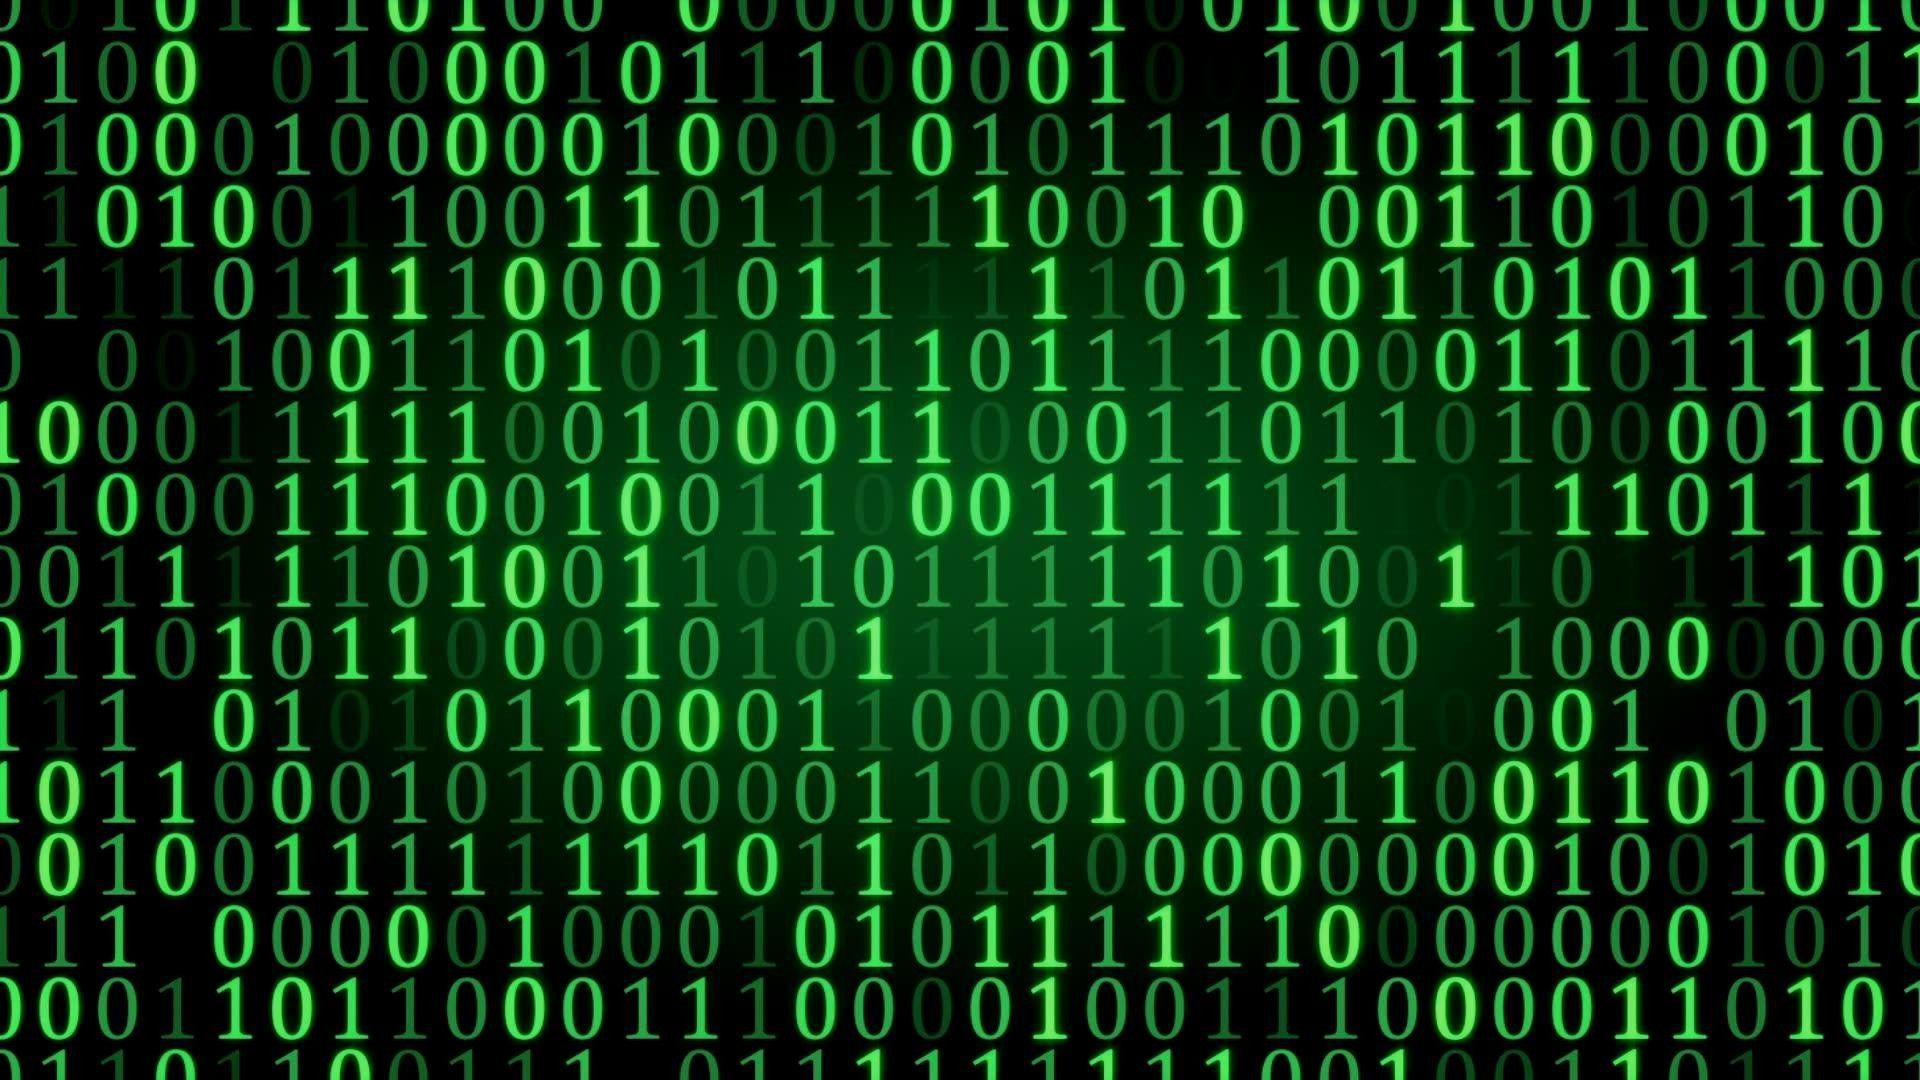 Wallpaper Sources Code Wallpaper Programming Languages Coding